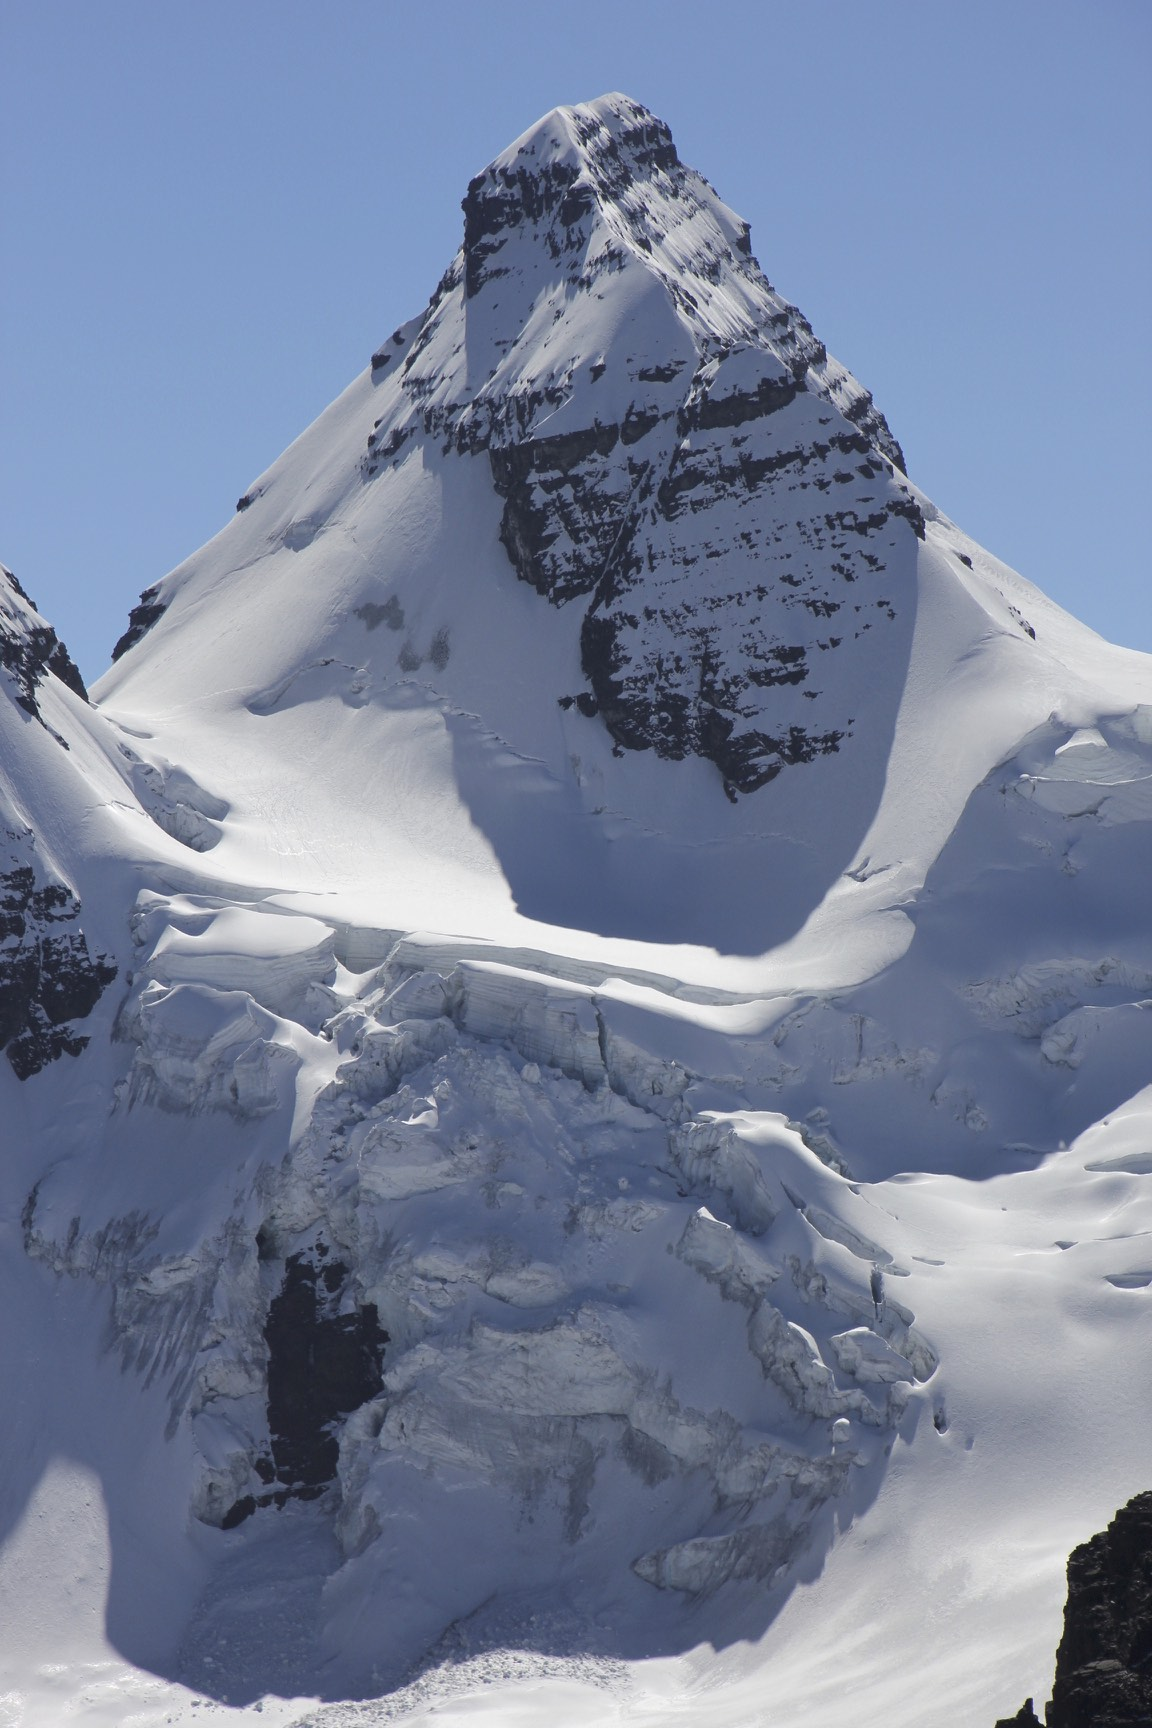 Condoriri 5,648m from Pico Austria 5,350 also known as the Matterhorn of Bolivia.